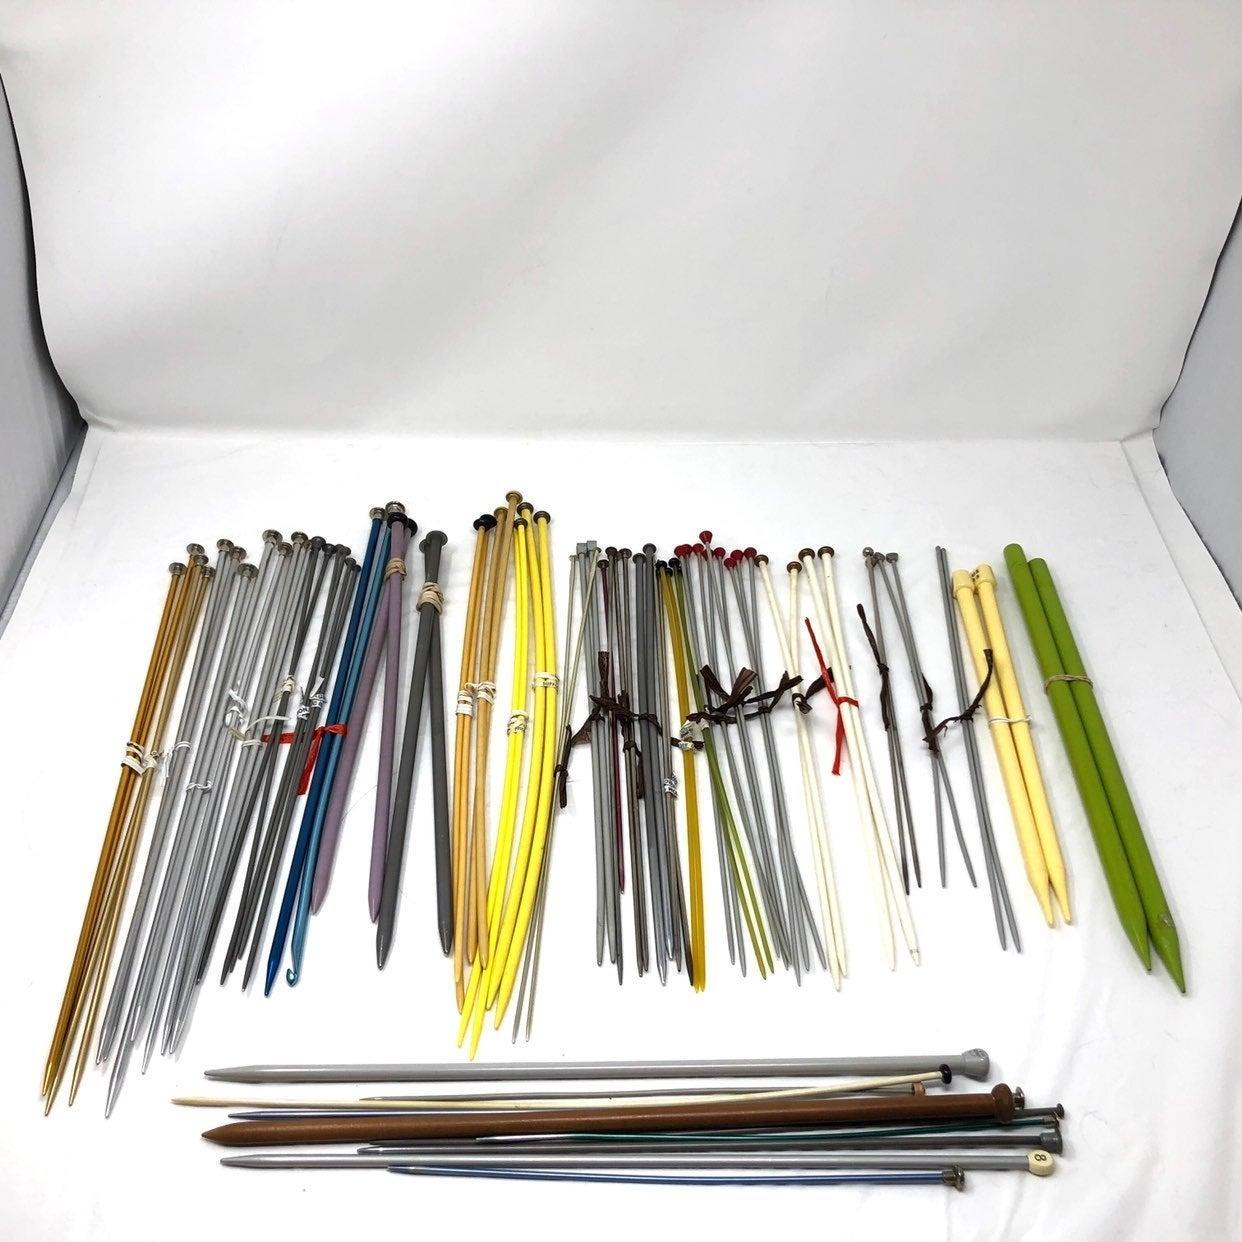 Lot of knitting needles